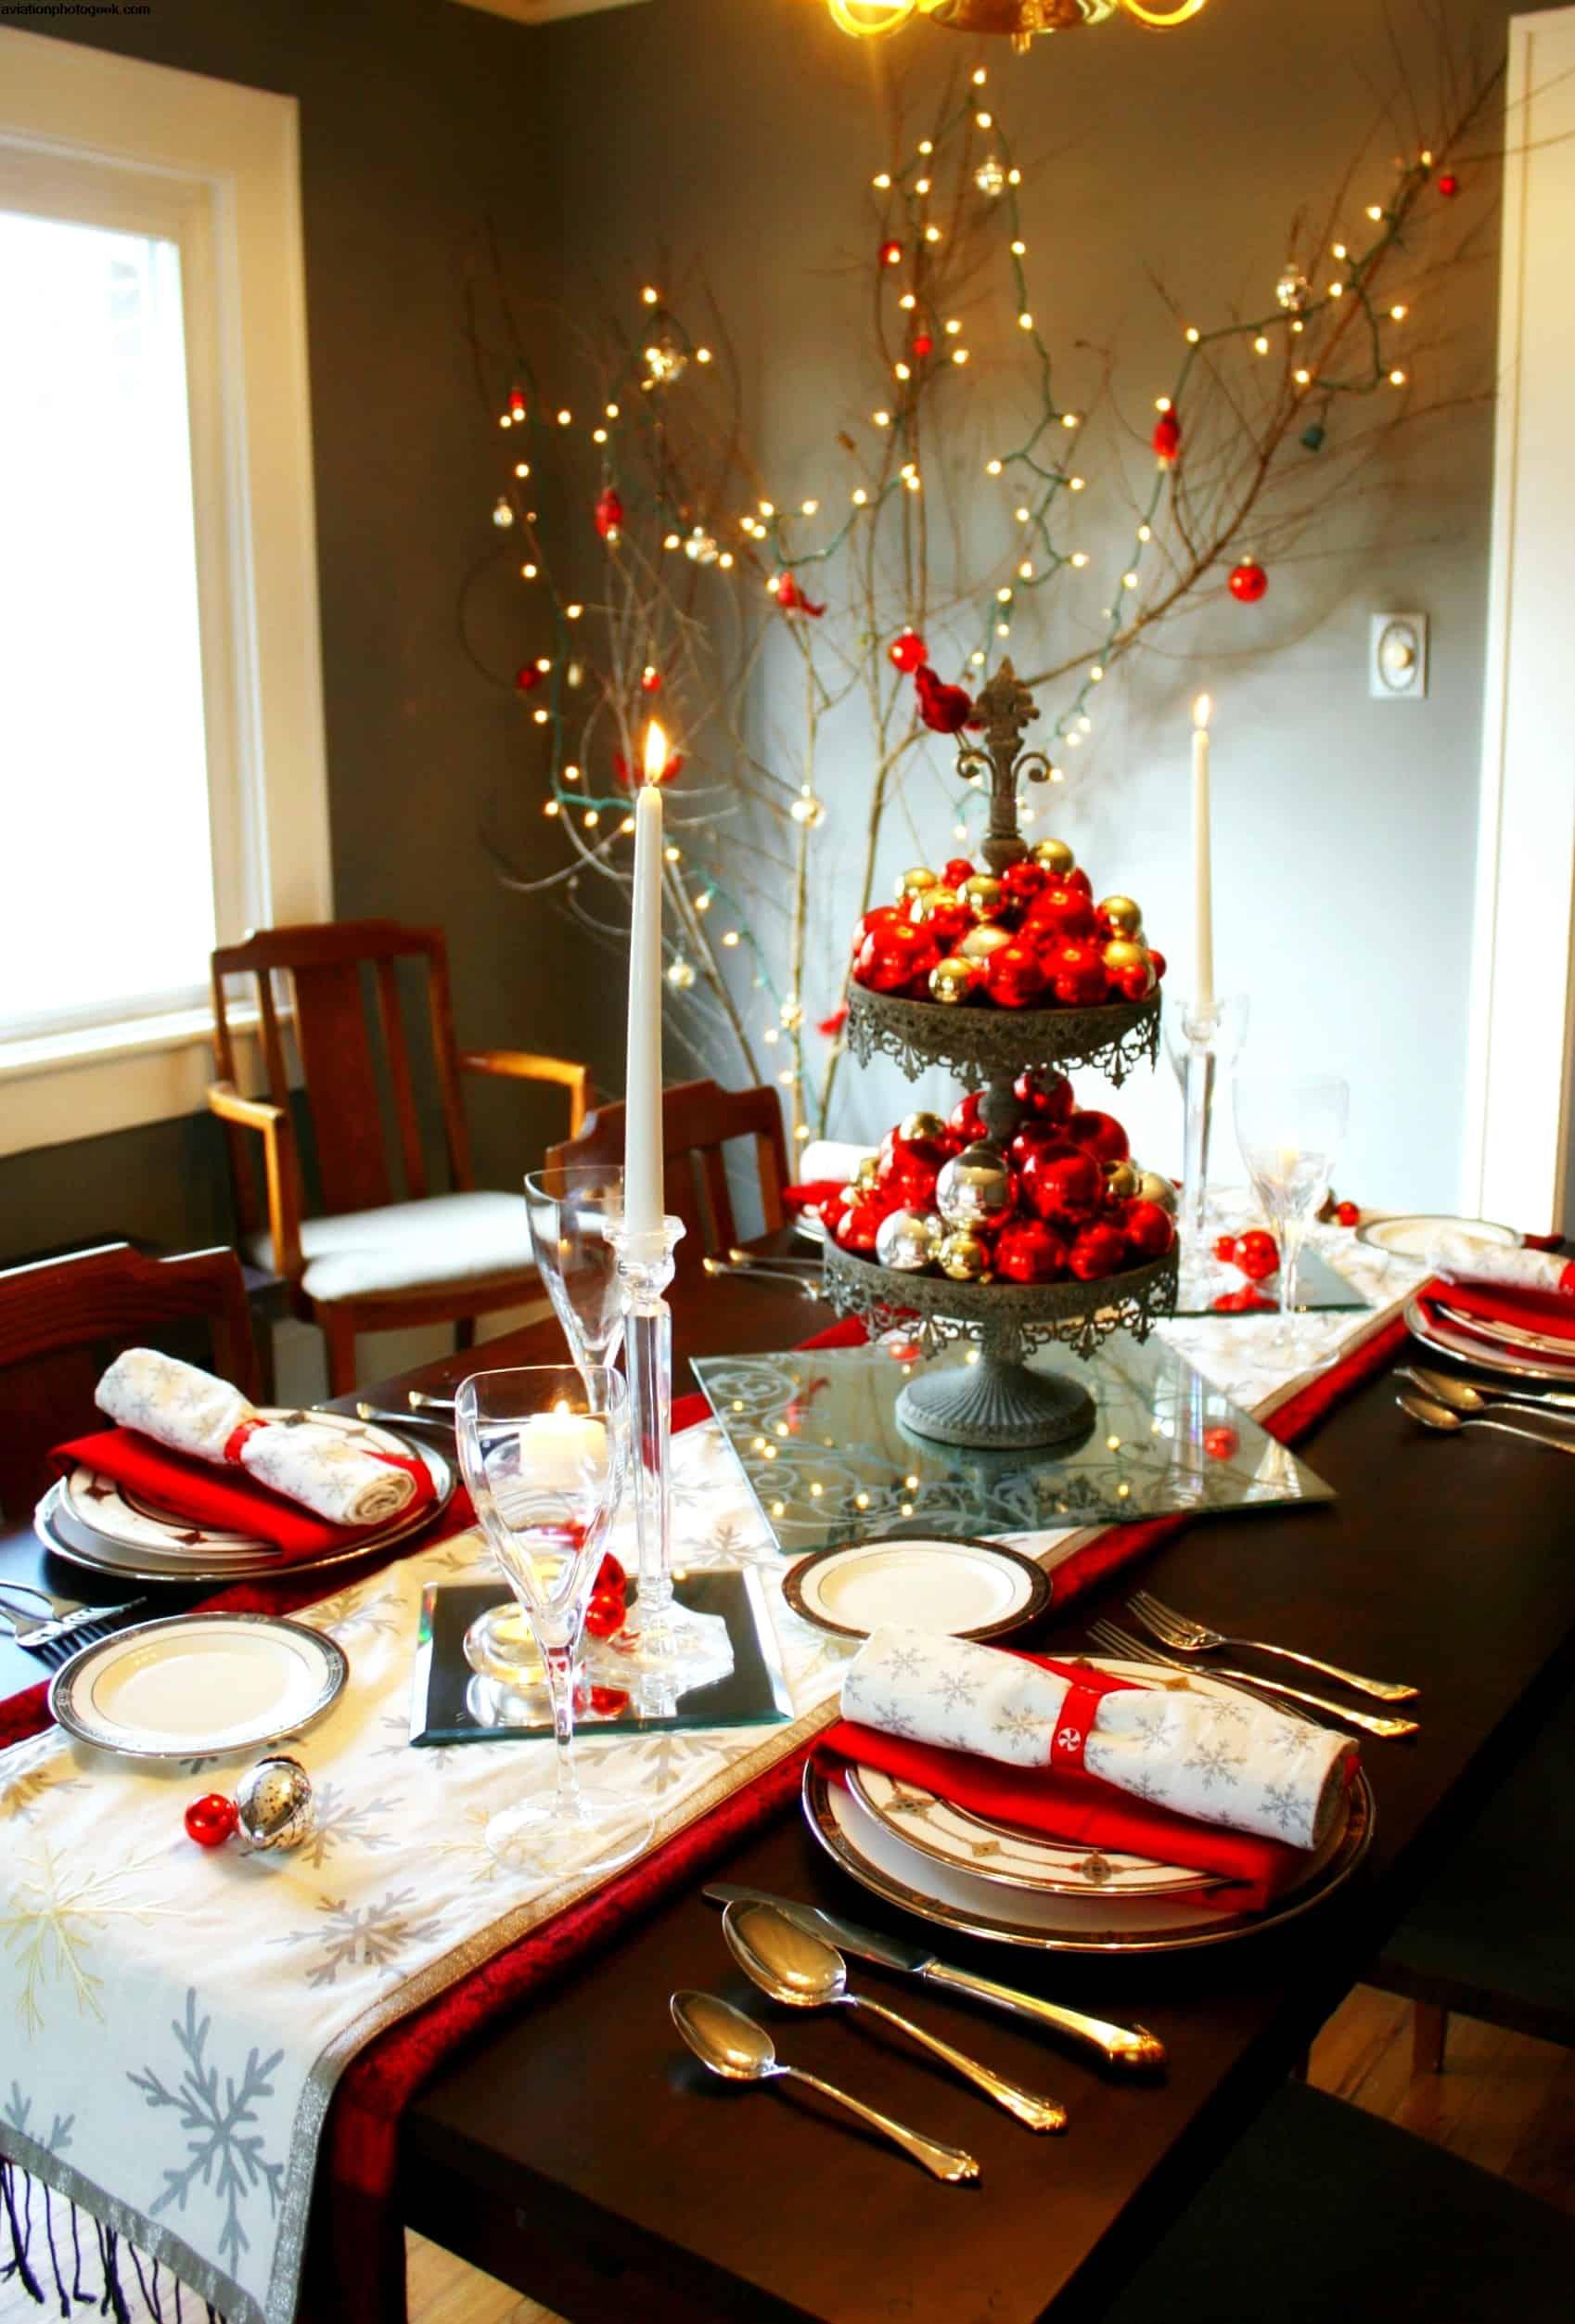 Christmas festives